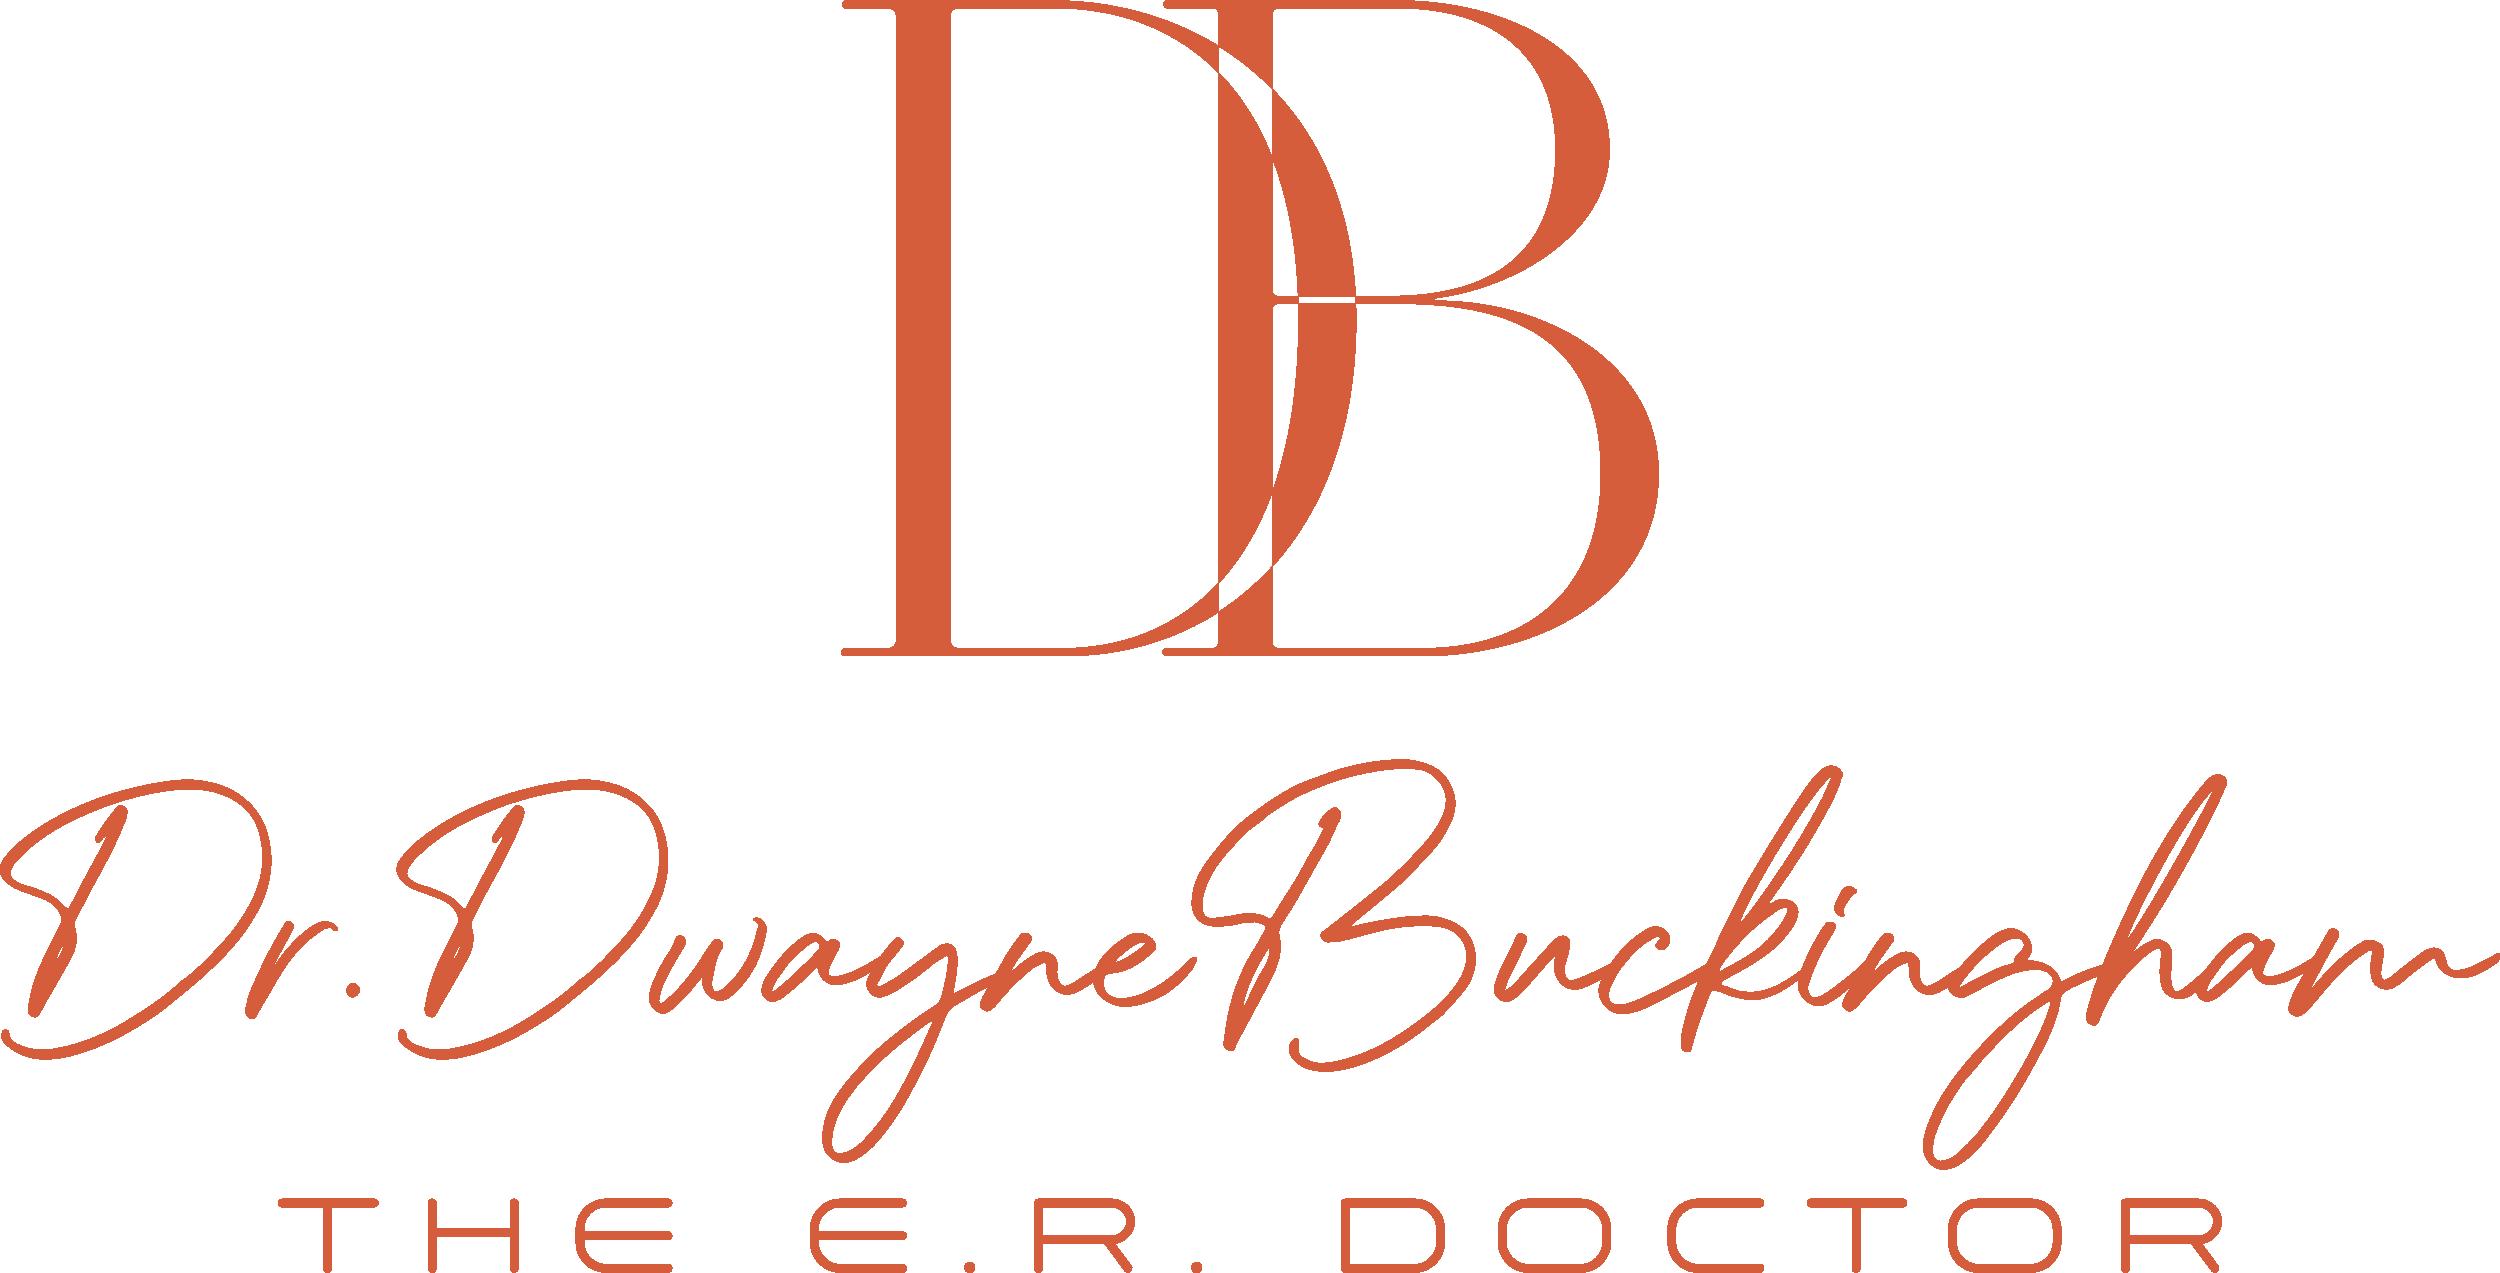 Dr. Buckingham